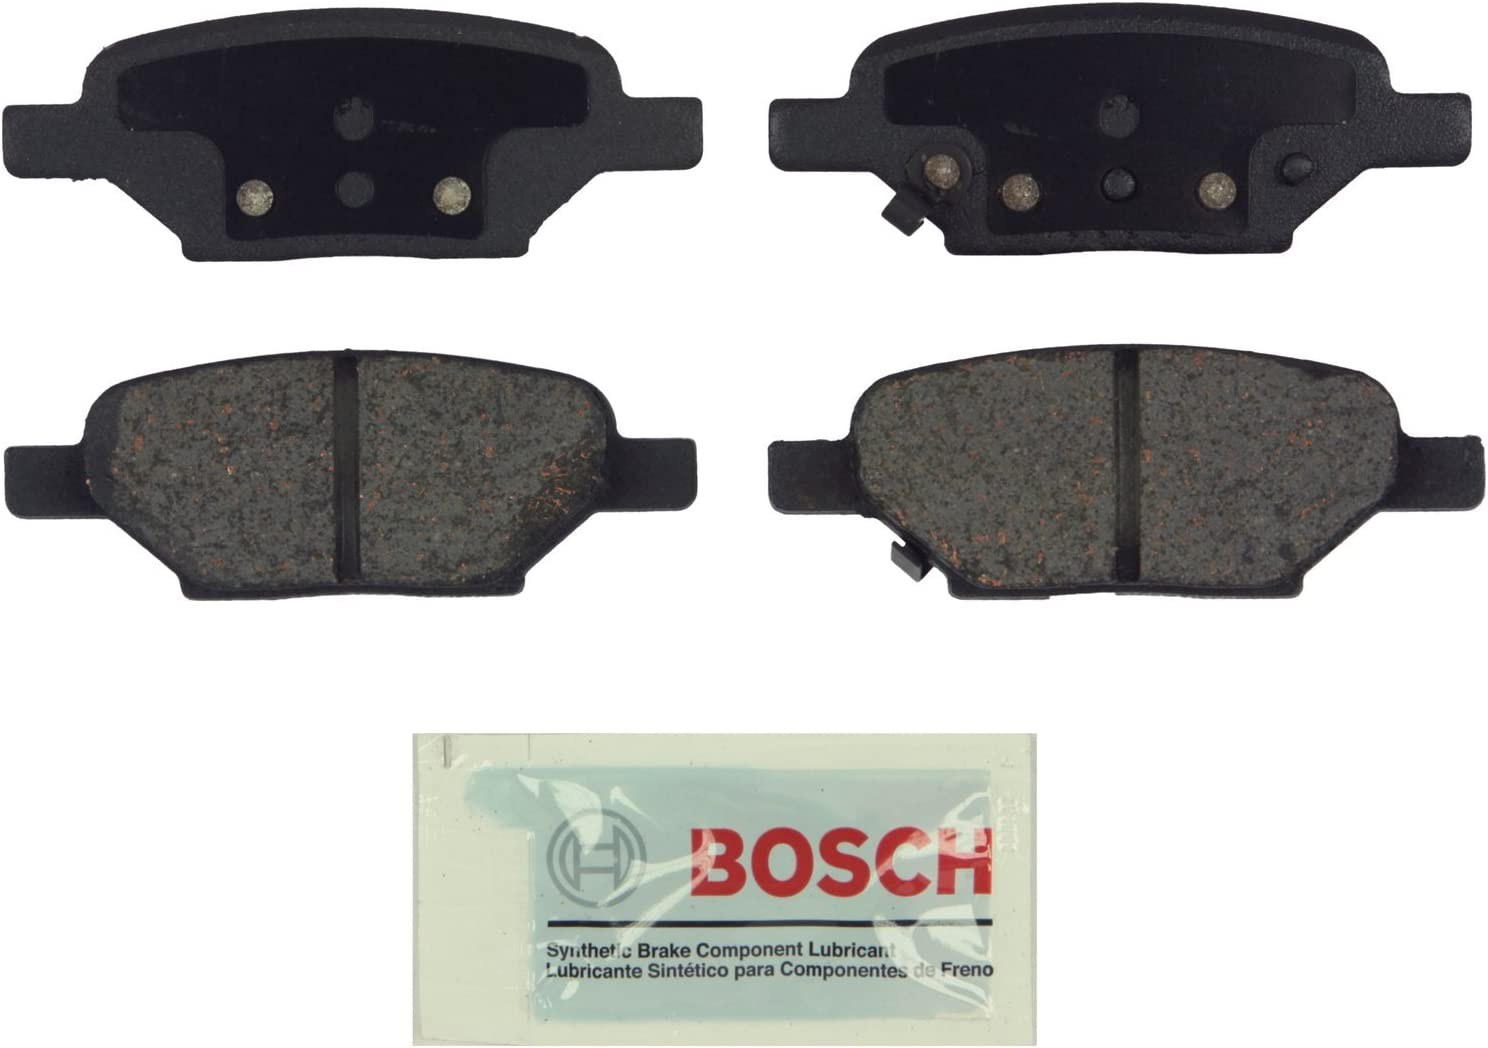 Bosch Brake Pad Sets 2-Wheel Set Front Driver /& Passenger Side New BC1160